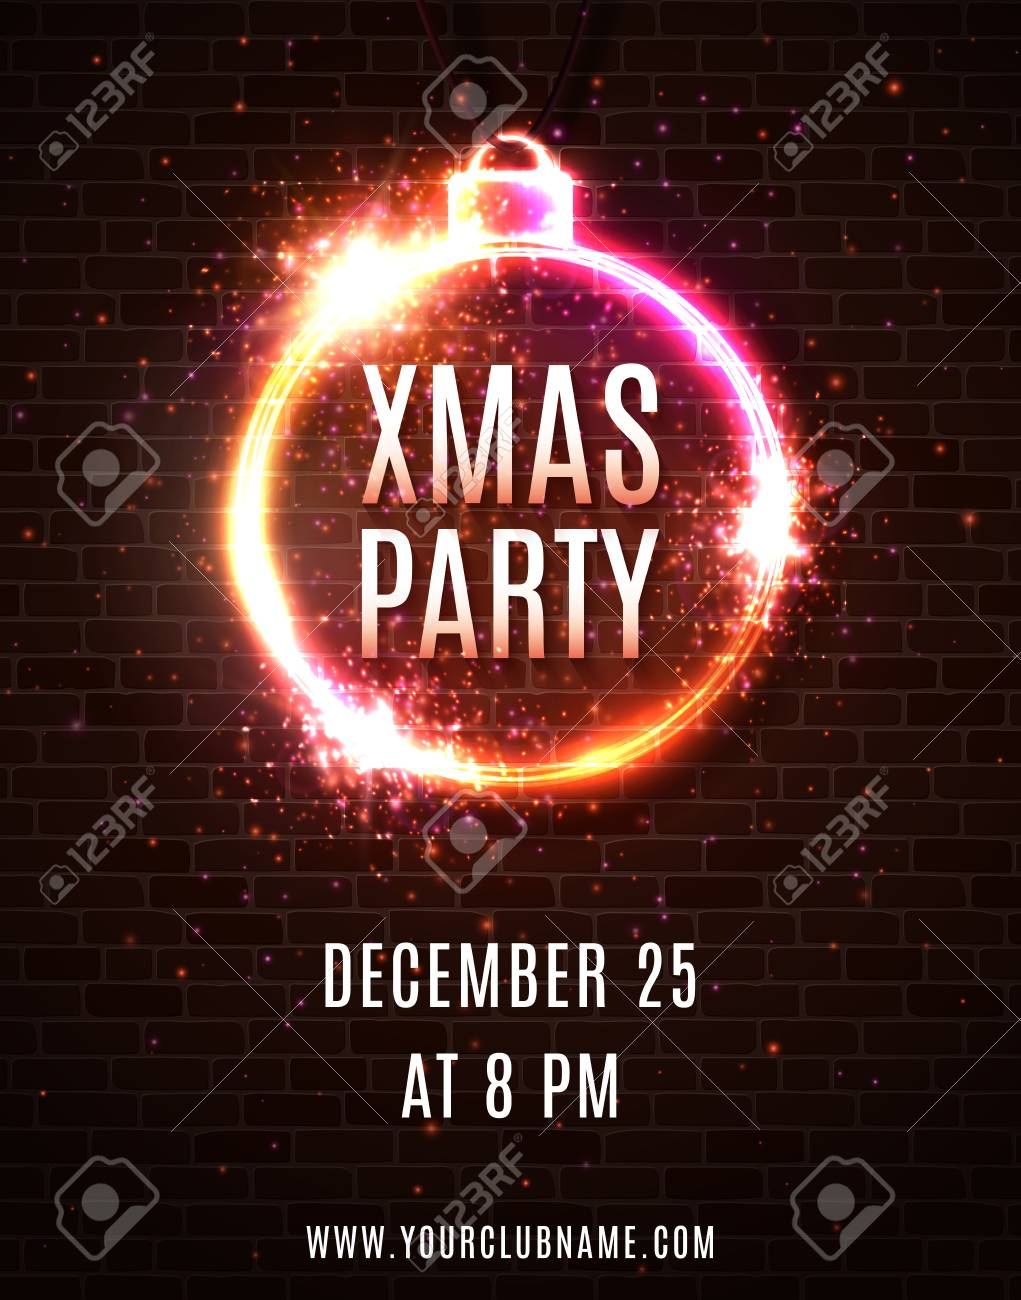 Free printable christmas party flyer templates.